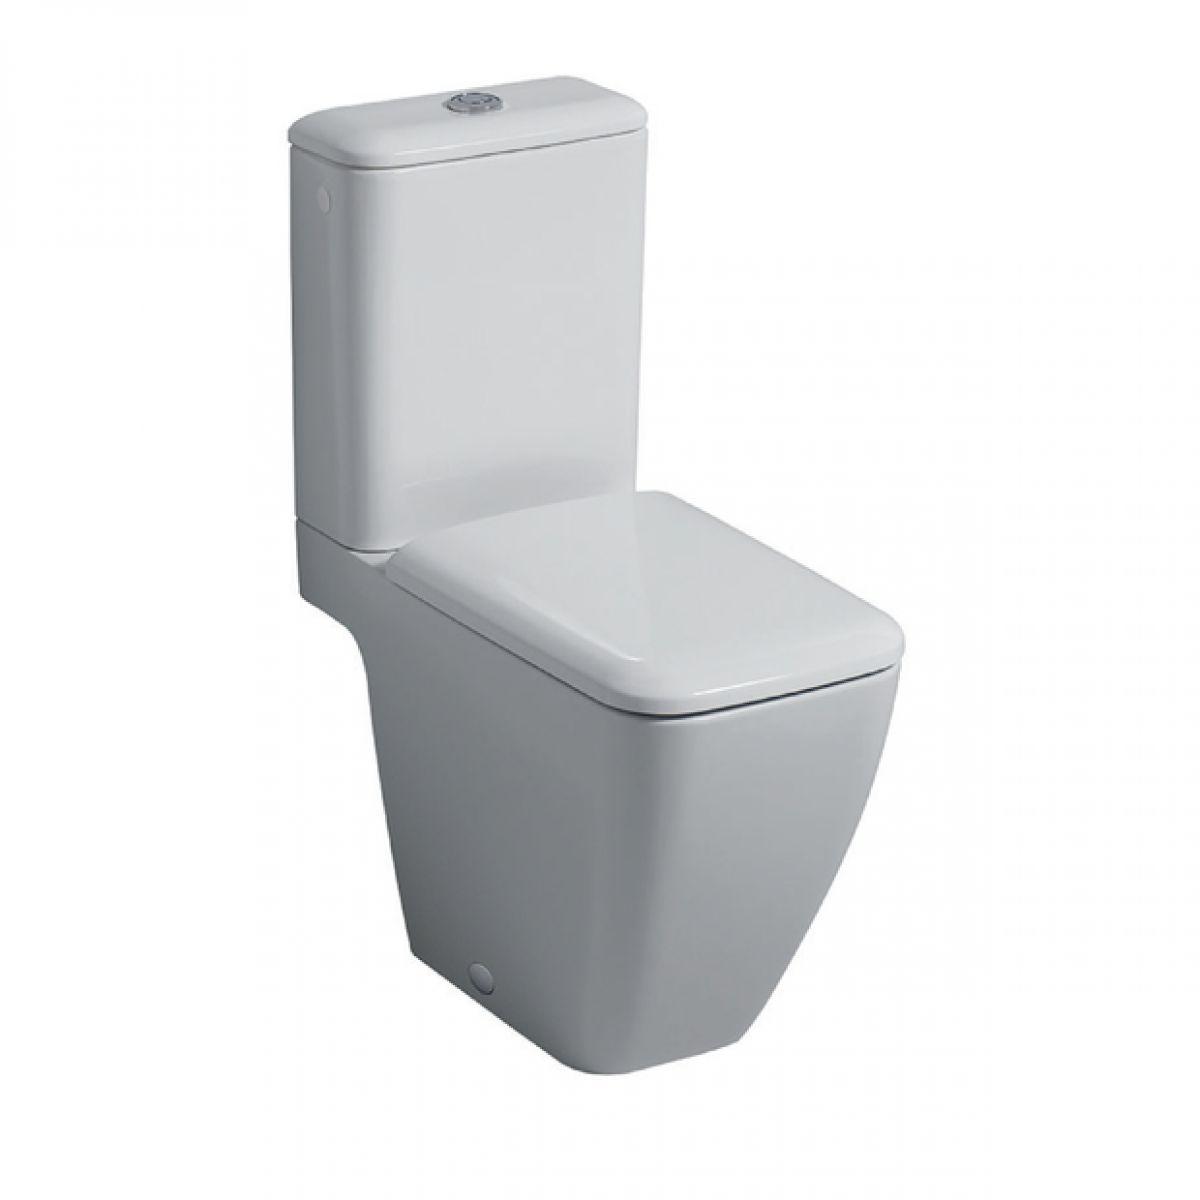 Geberit icon square close coupled rimfree toilet uk for Geberit us